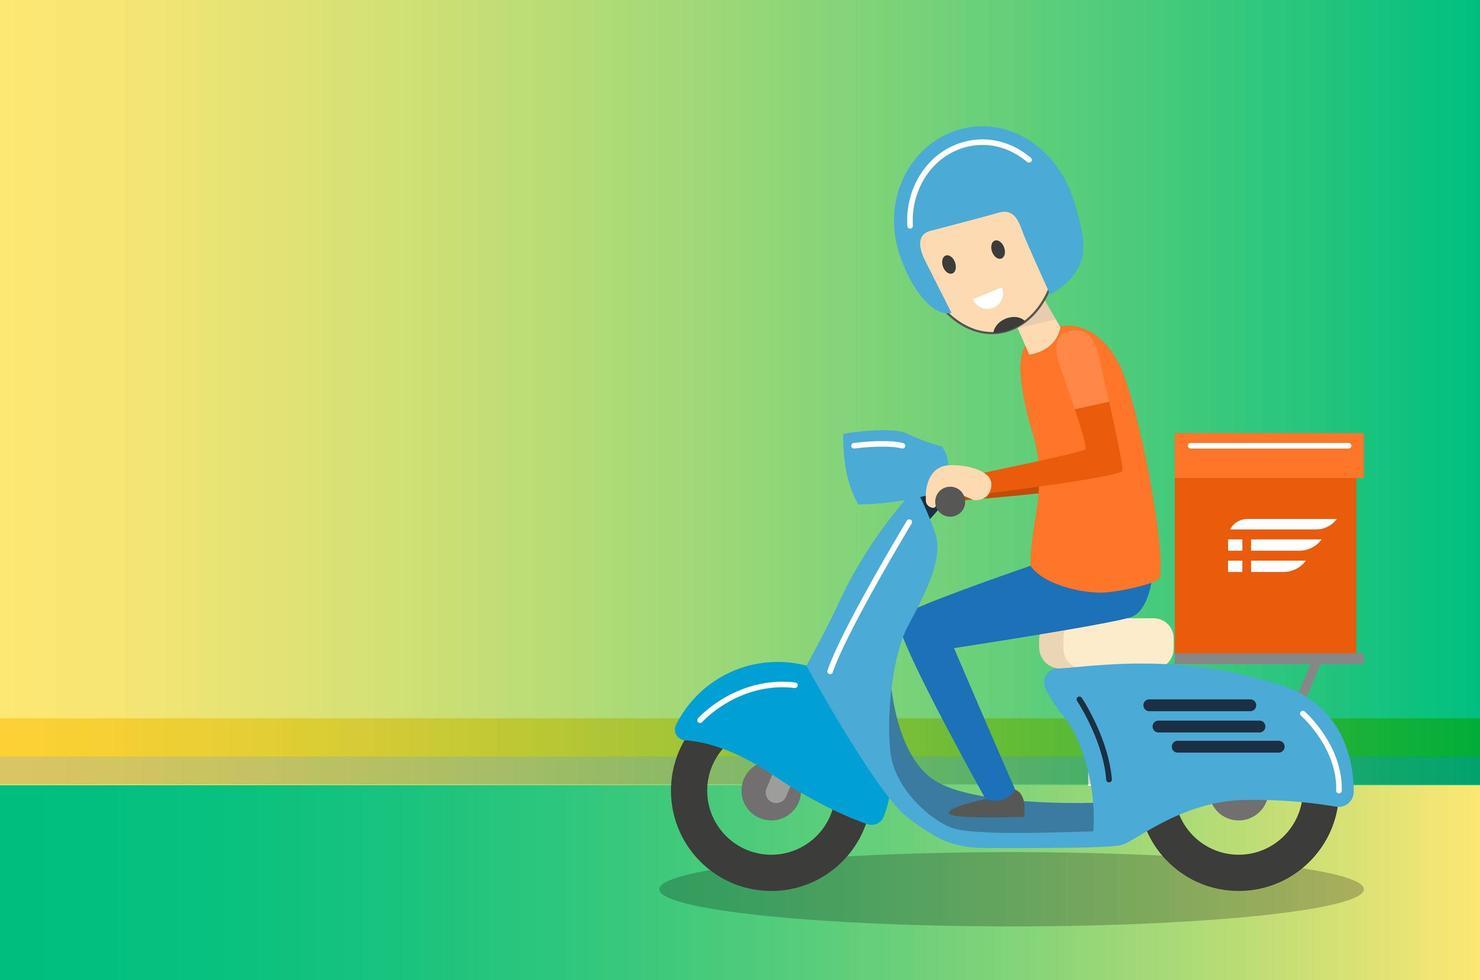 Leverans Boy Ride Scooter Motorcykel Service vektor